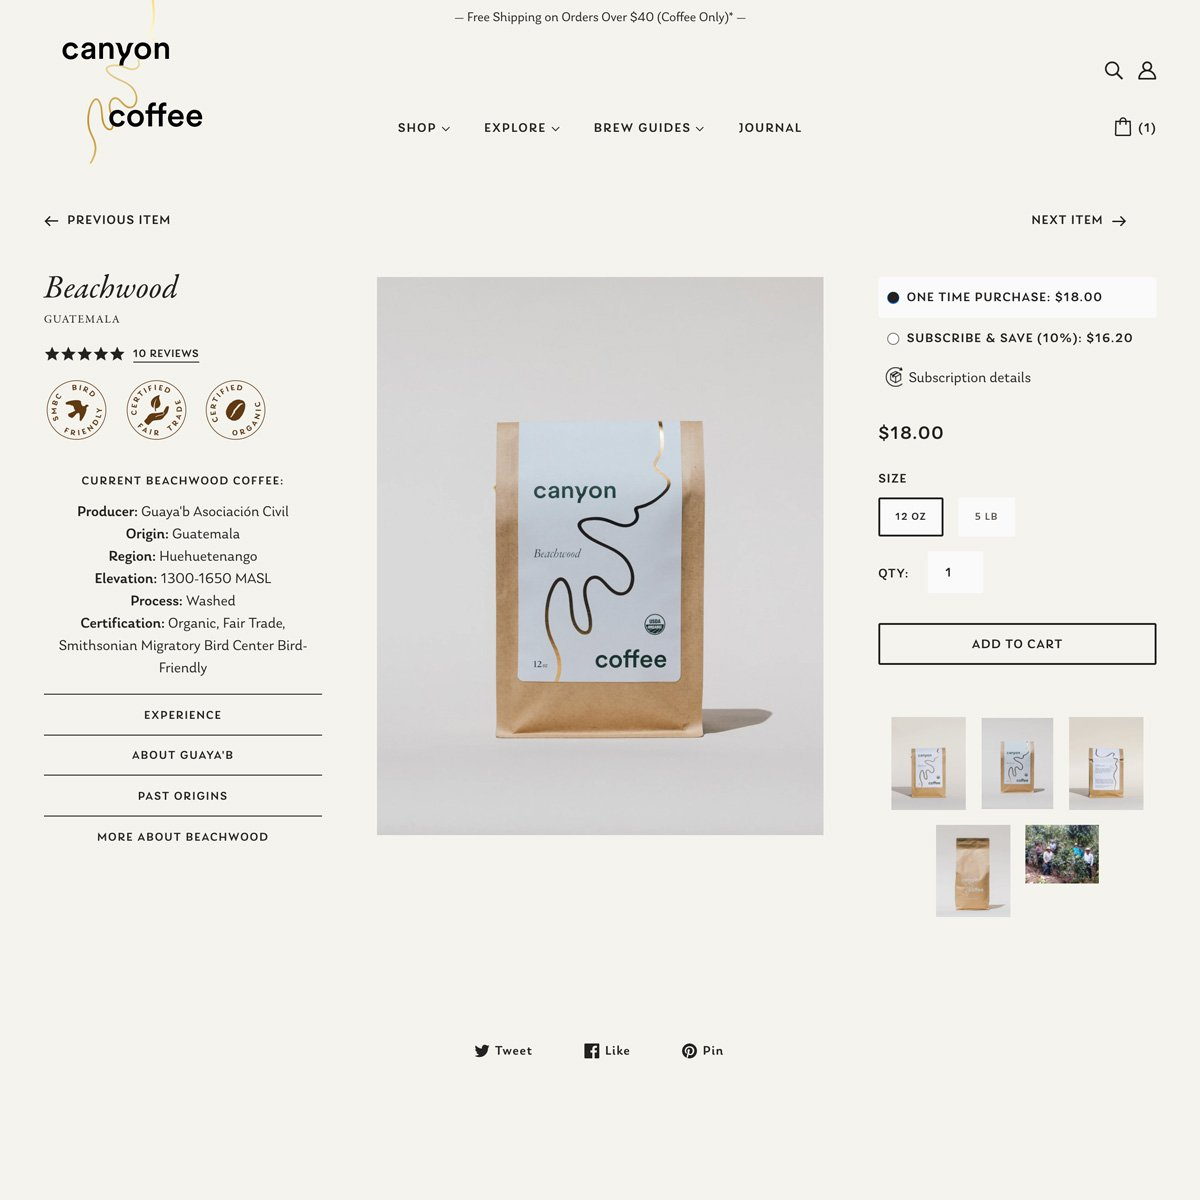 Canyon Coffee Web Design - Desktop - Product Page